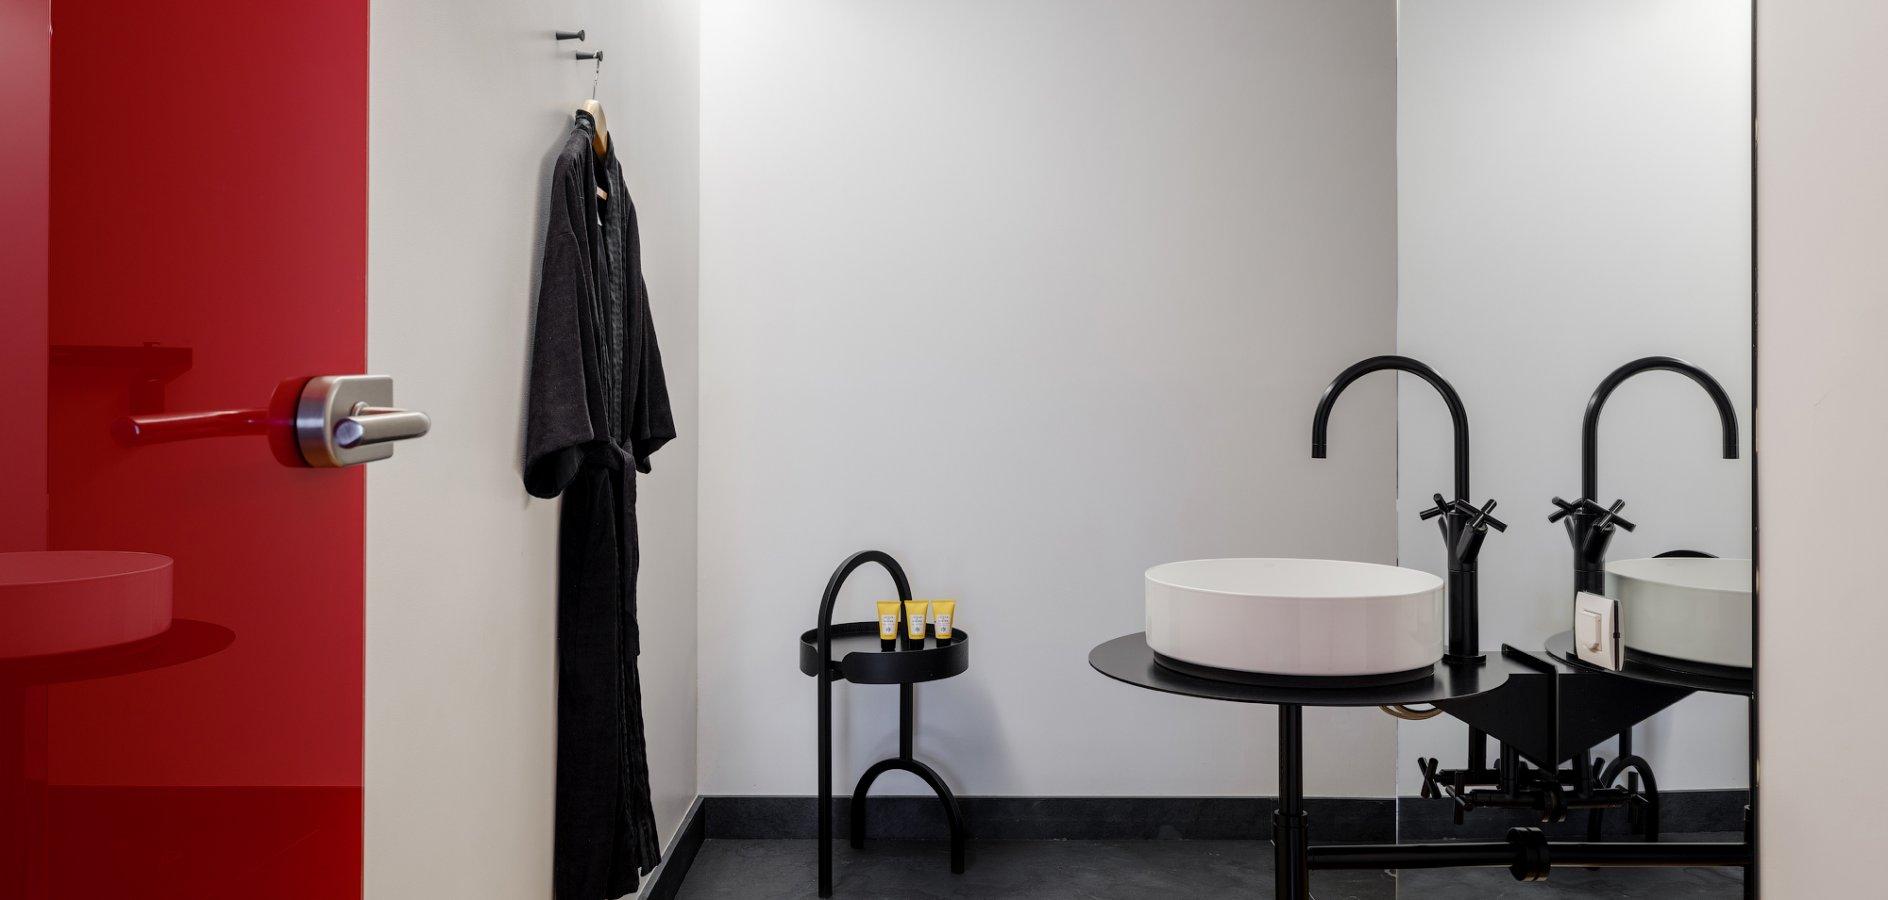 hotel, bathroom, design, architecture, Laufen, Laufen bathrooms